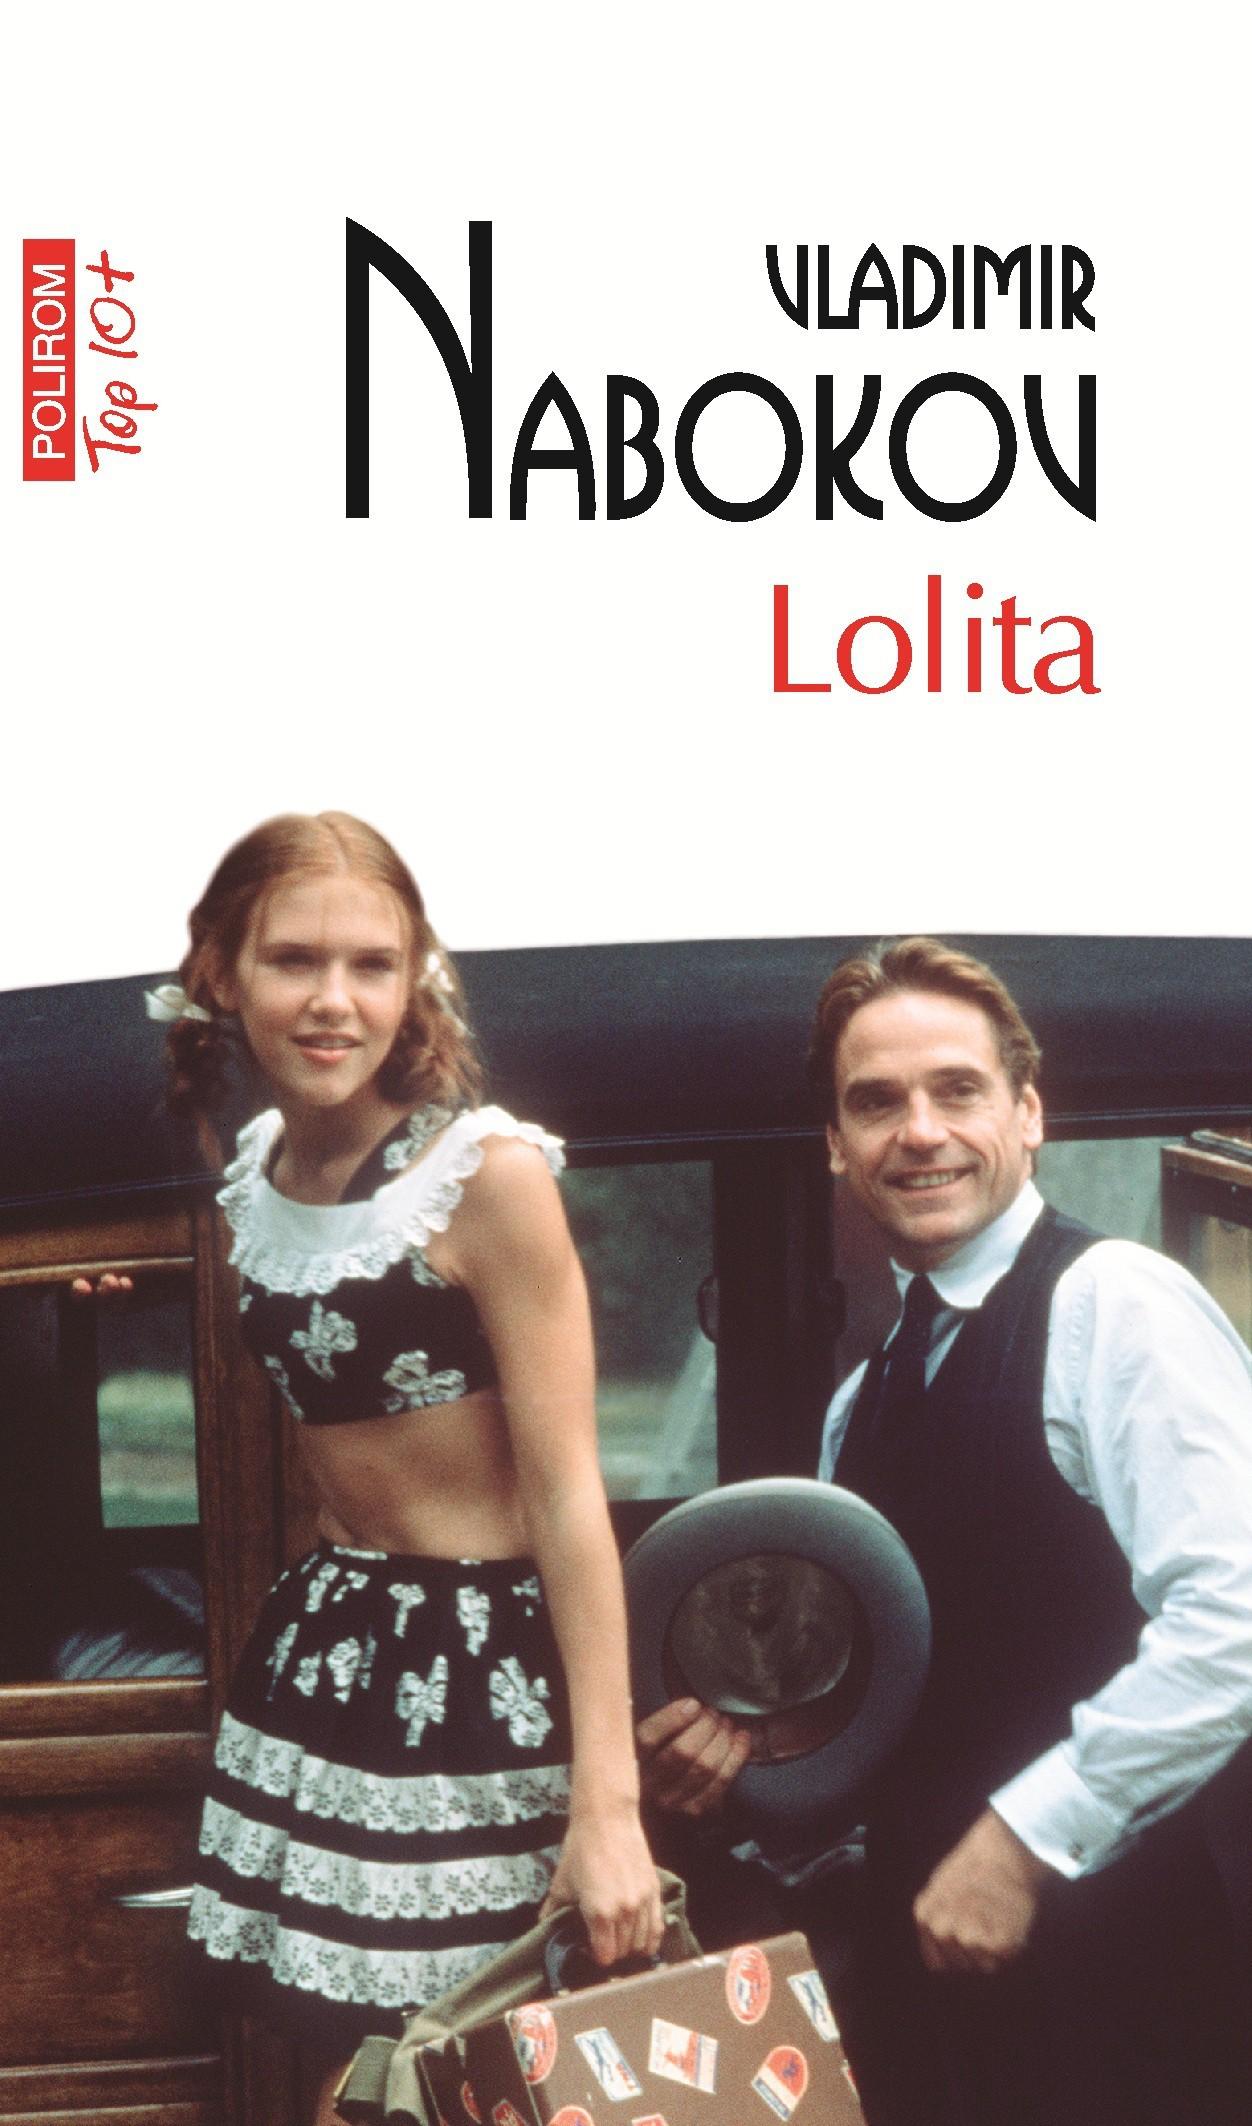 Vladimir Nabokov - Lolita (Top 10+) -